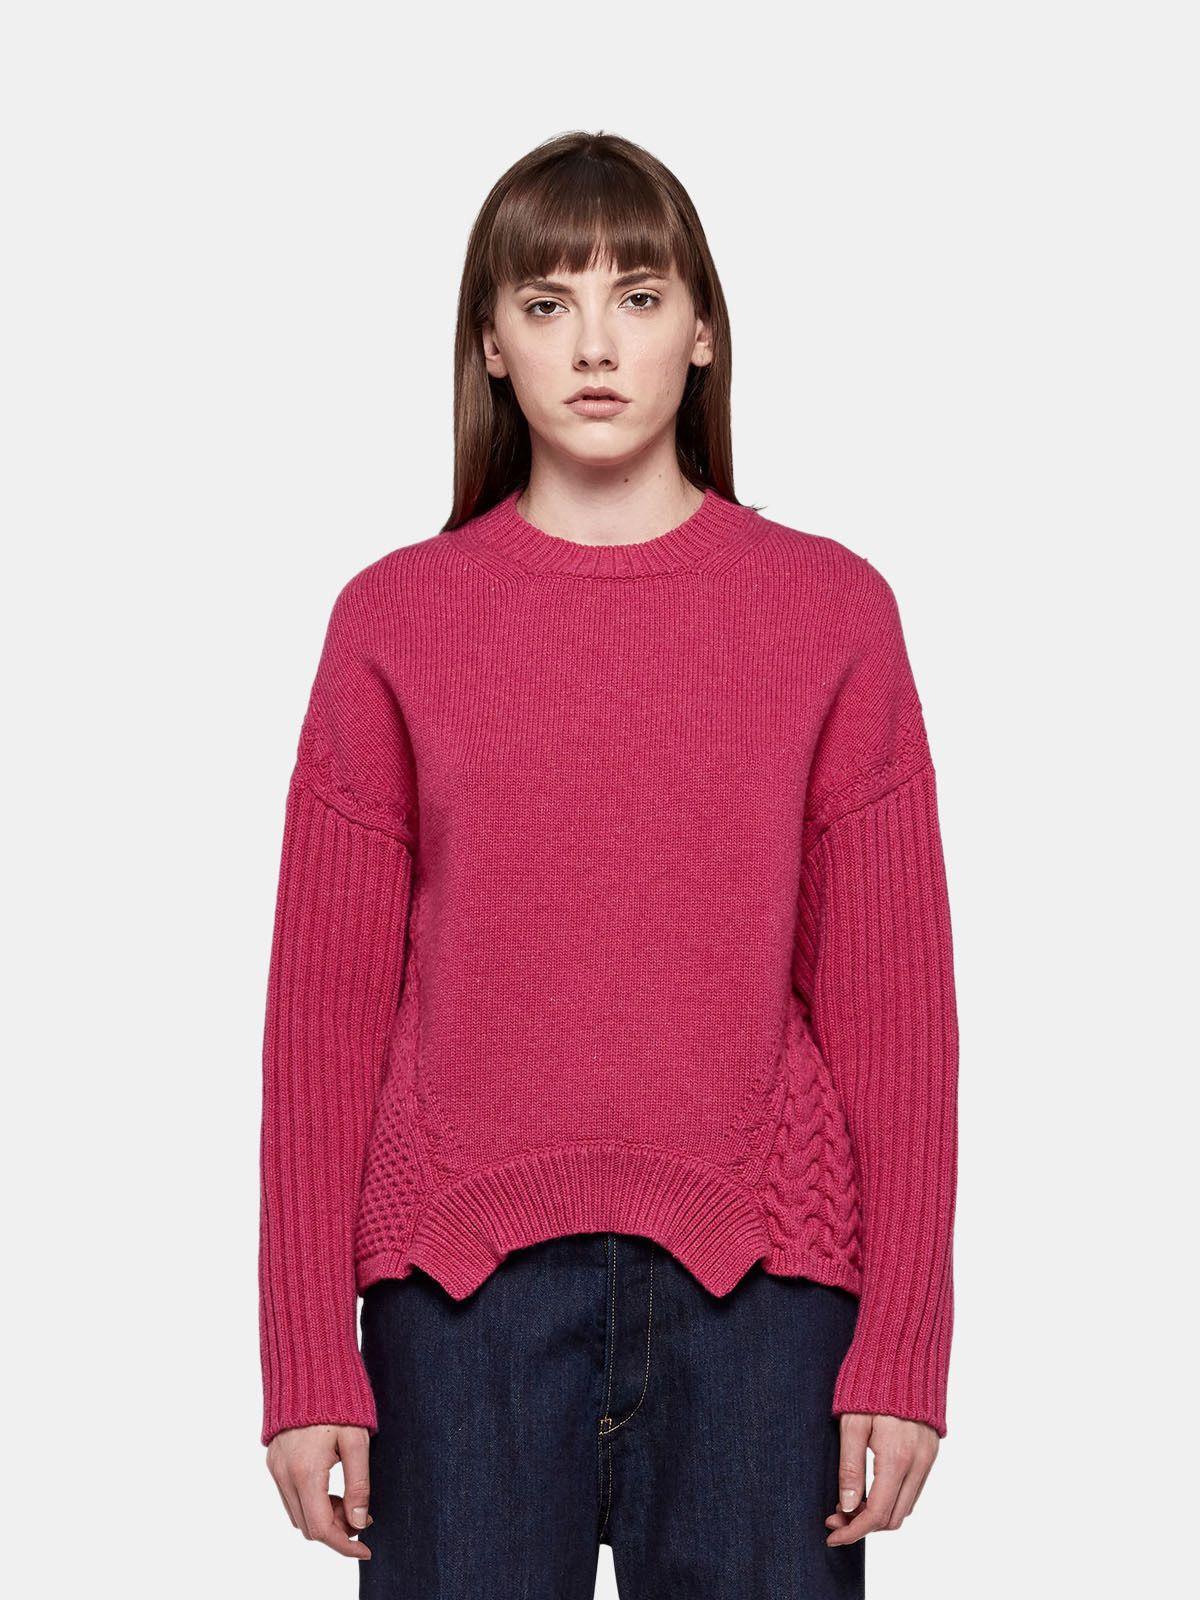 Golden Goose - Monoirobara sweater in extrafine merino wool in